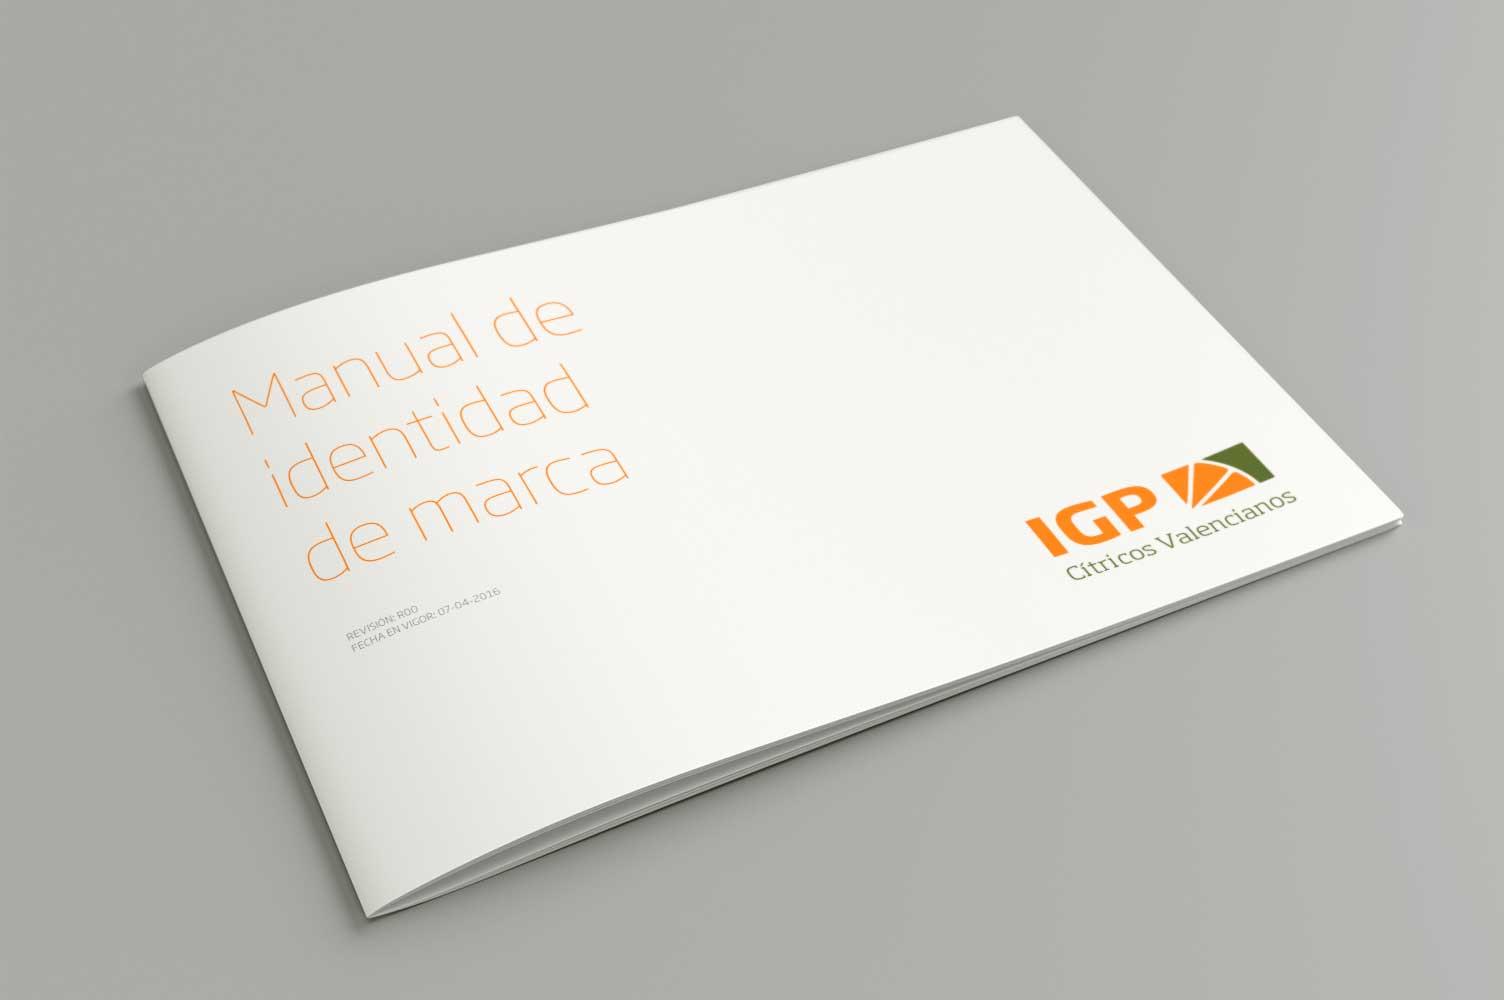 Portada manual de identidad corporativa IGP